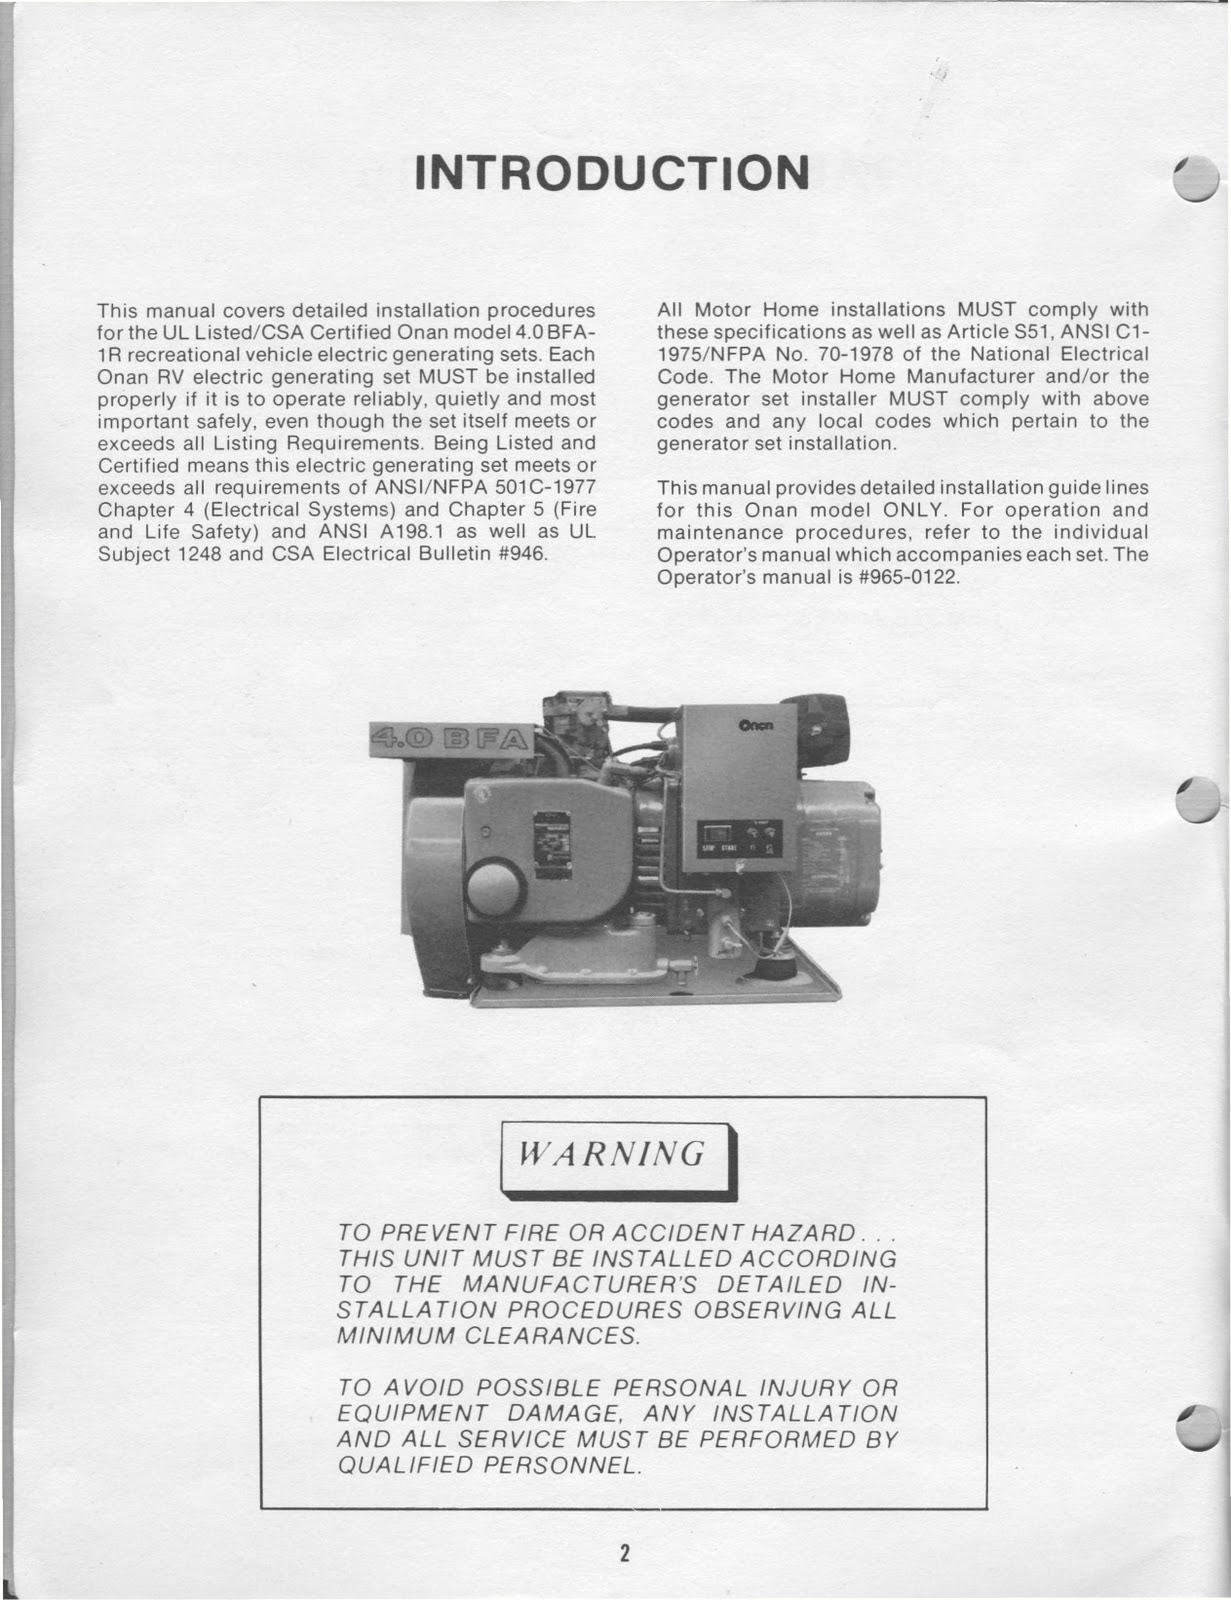 Onan Bfa Service Manual s